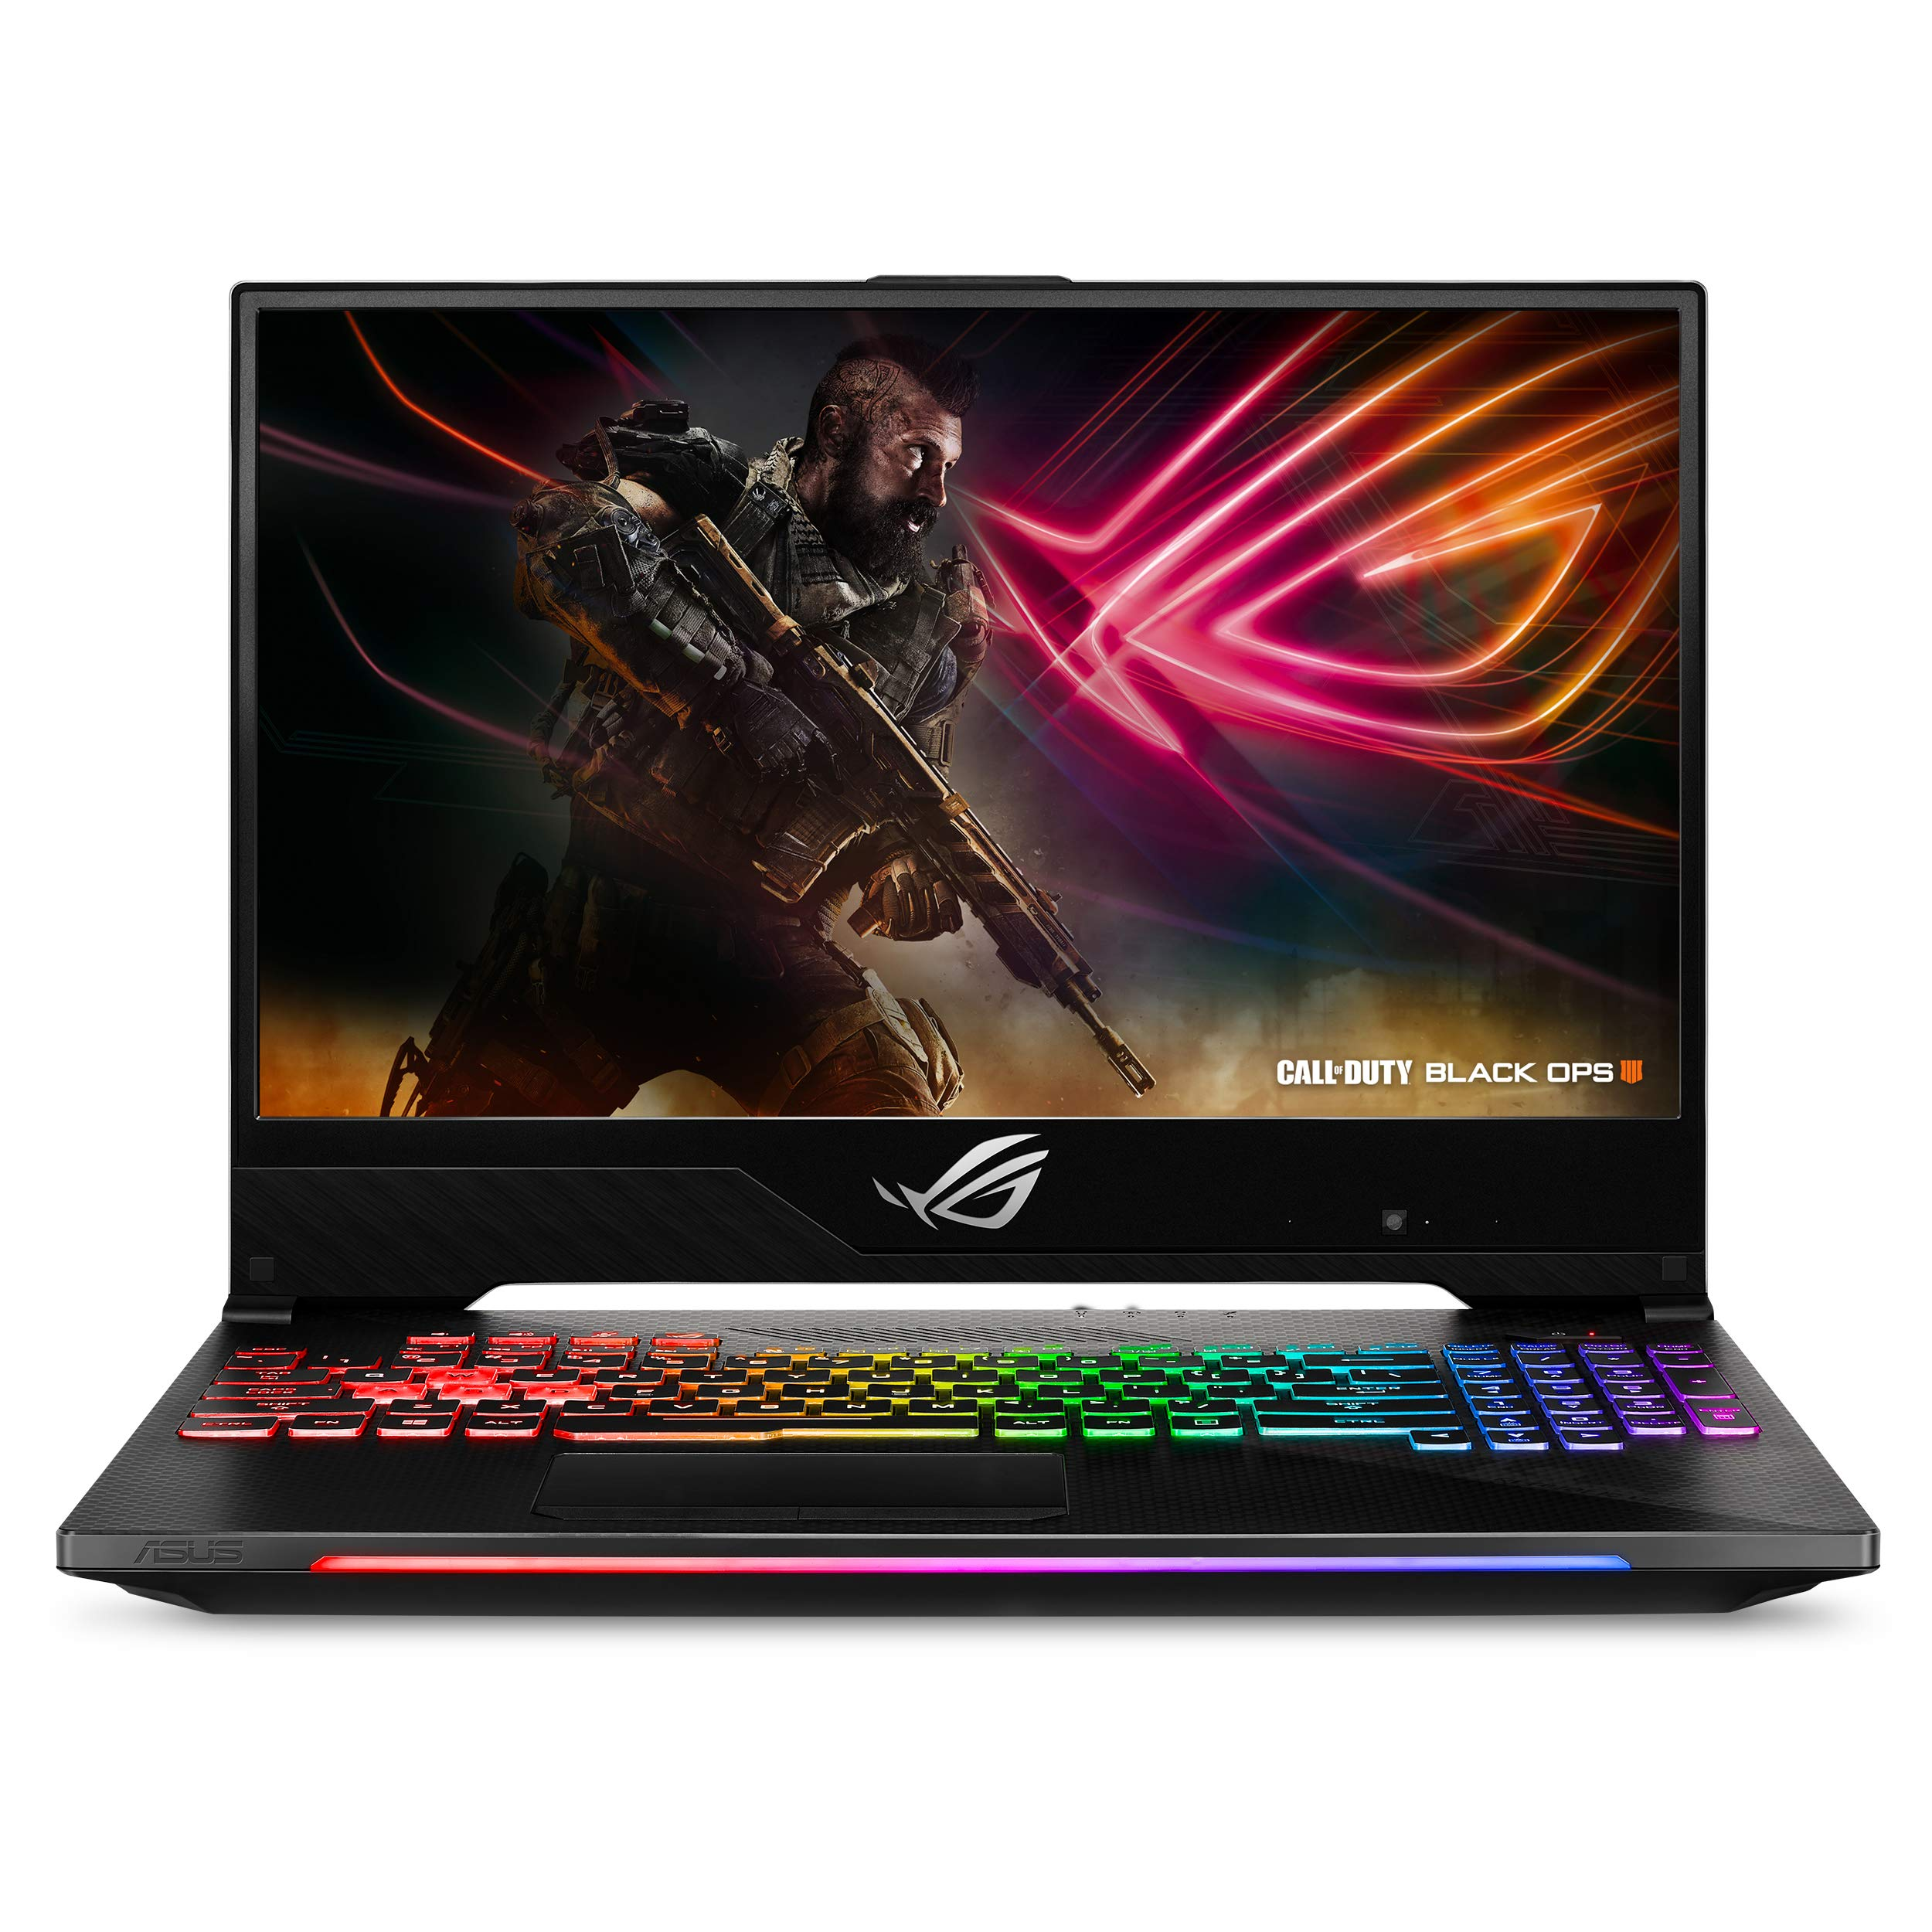 "ASUS ROG Strix SCAR II Slim Gaming Laptop GL504, 15.6"" 144Hz IPS Type, NVIDIA GeForce GTX 1070, Intel Core i7-8750H Processor, 16GB DDR4, 256GB PCIe SSD + 1TB SSHD, Windows 10 Home - GL504GS-DS74"